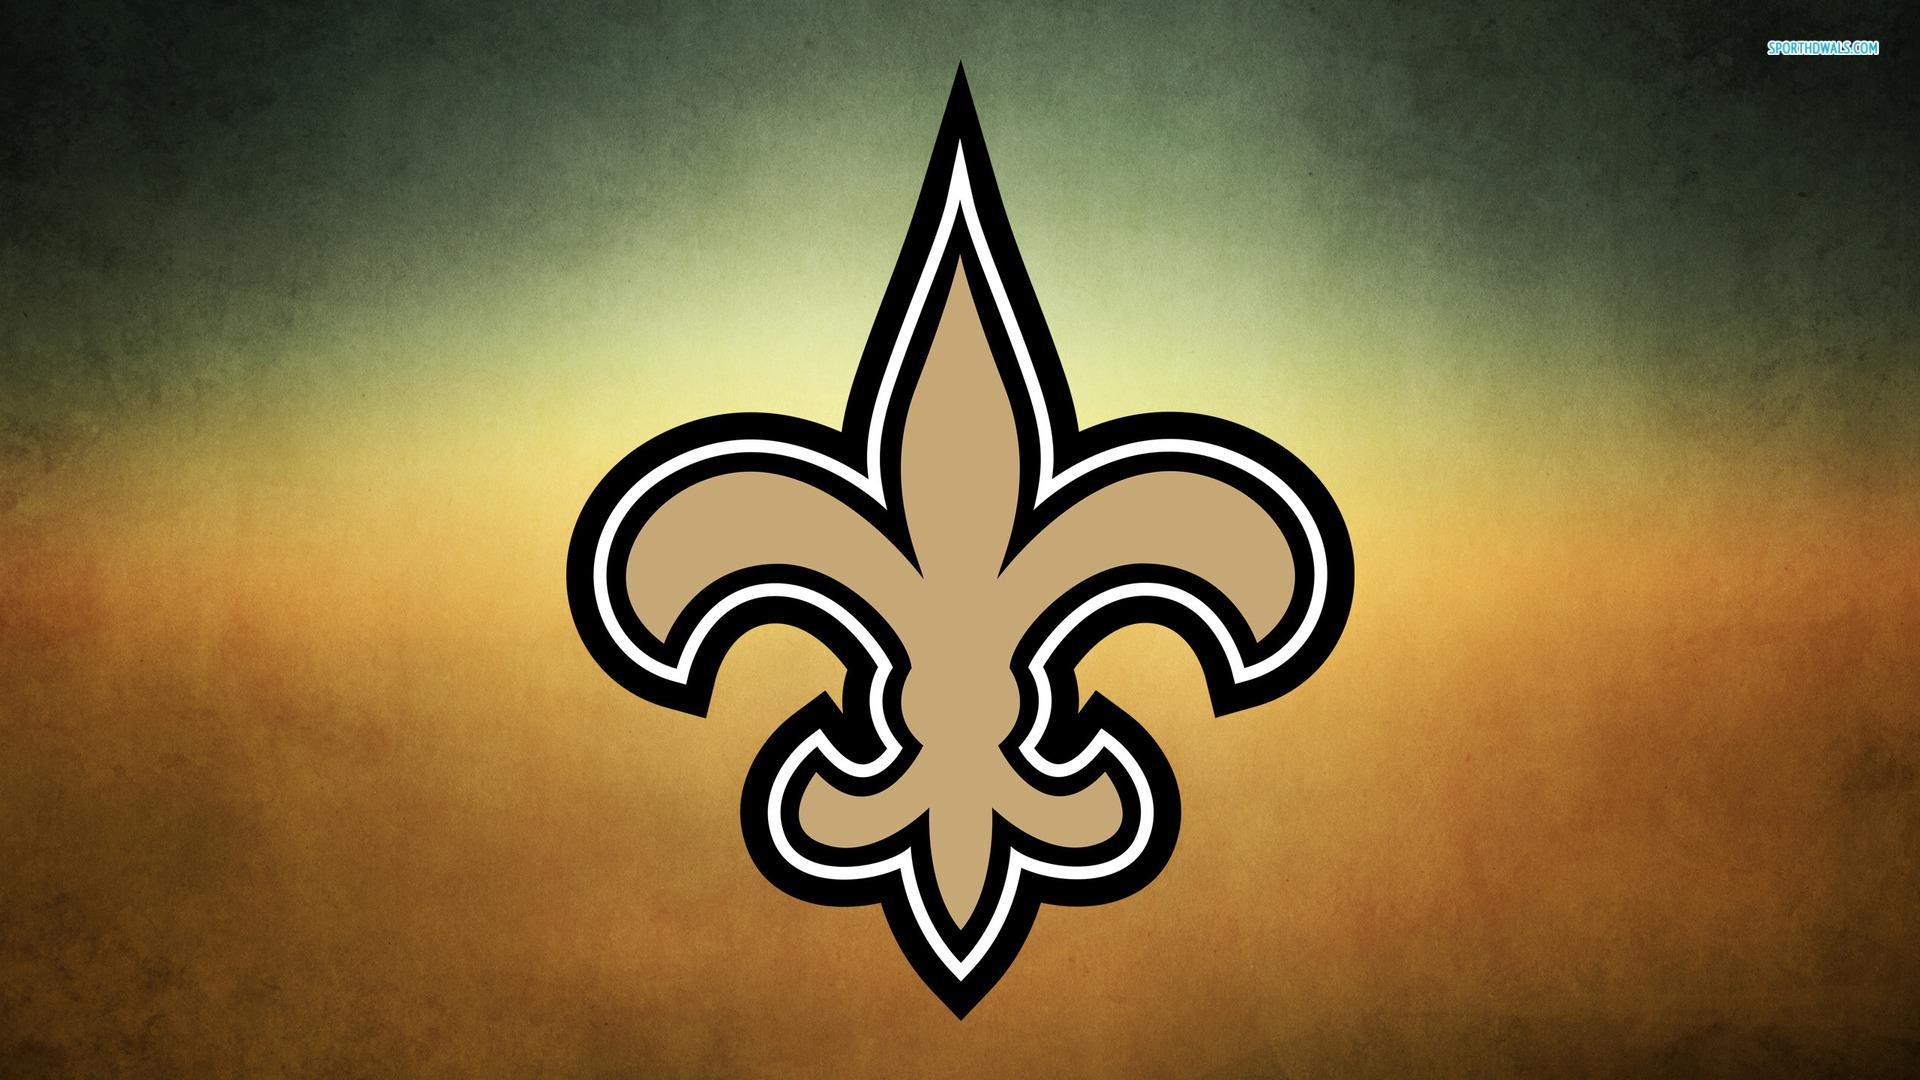 New Orleans Saints Logo wallpaper 187044 1920x1080